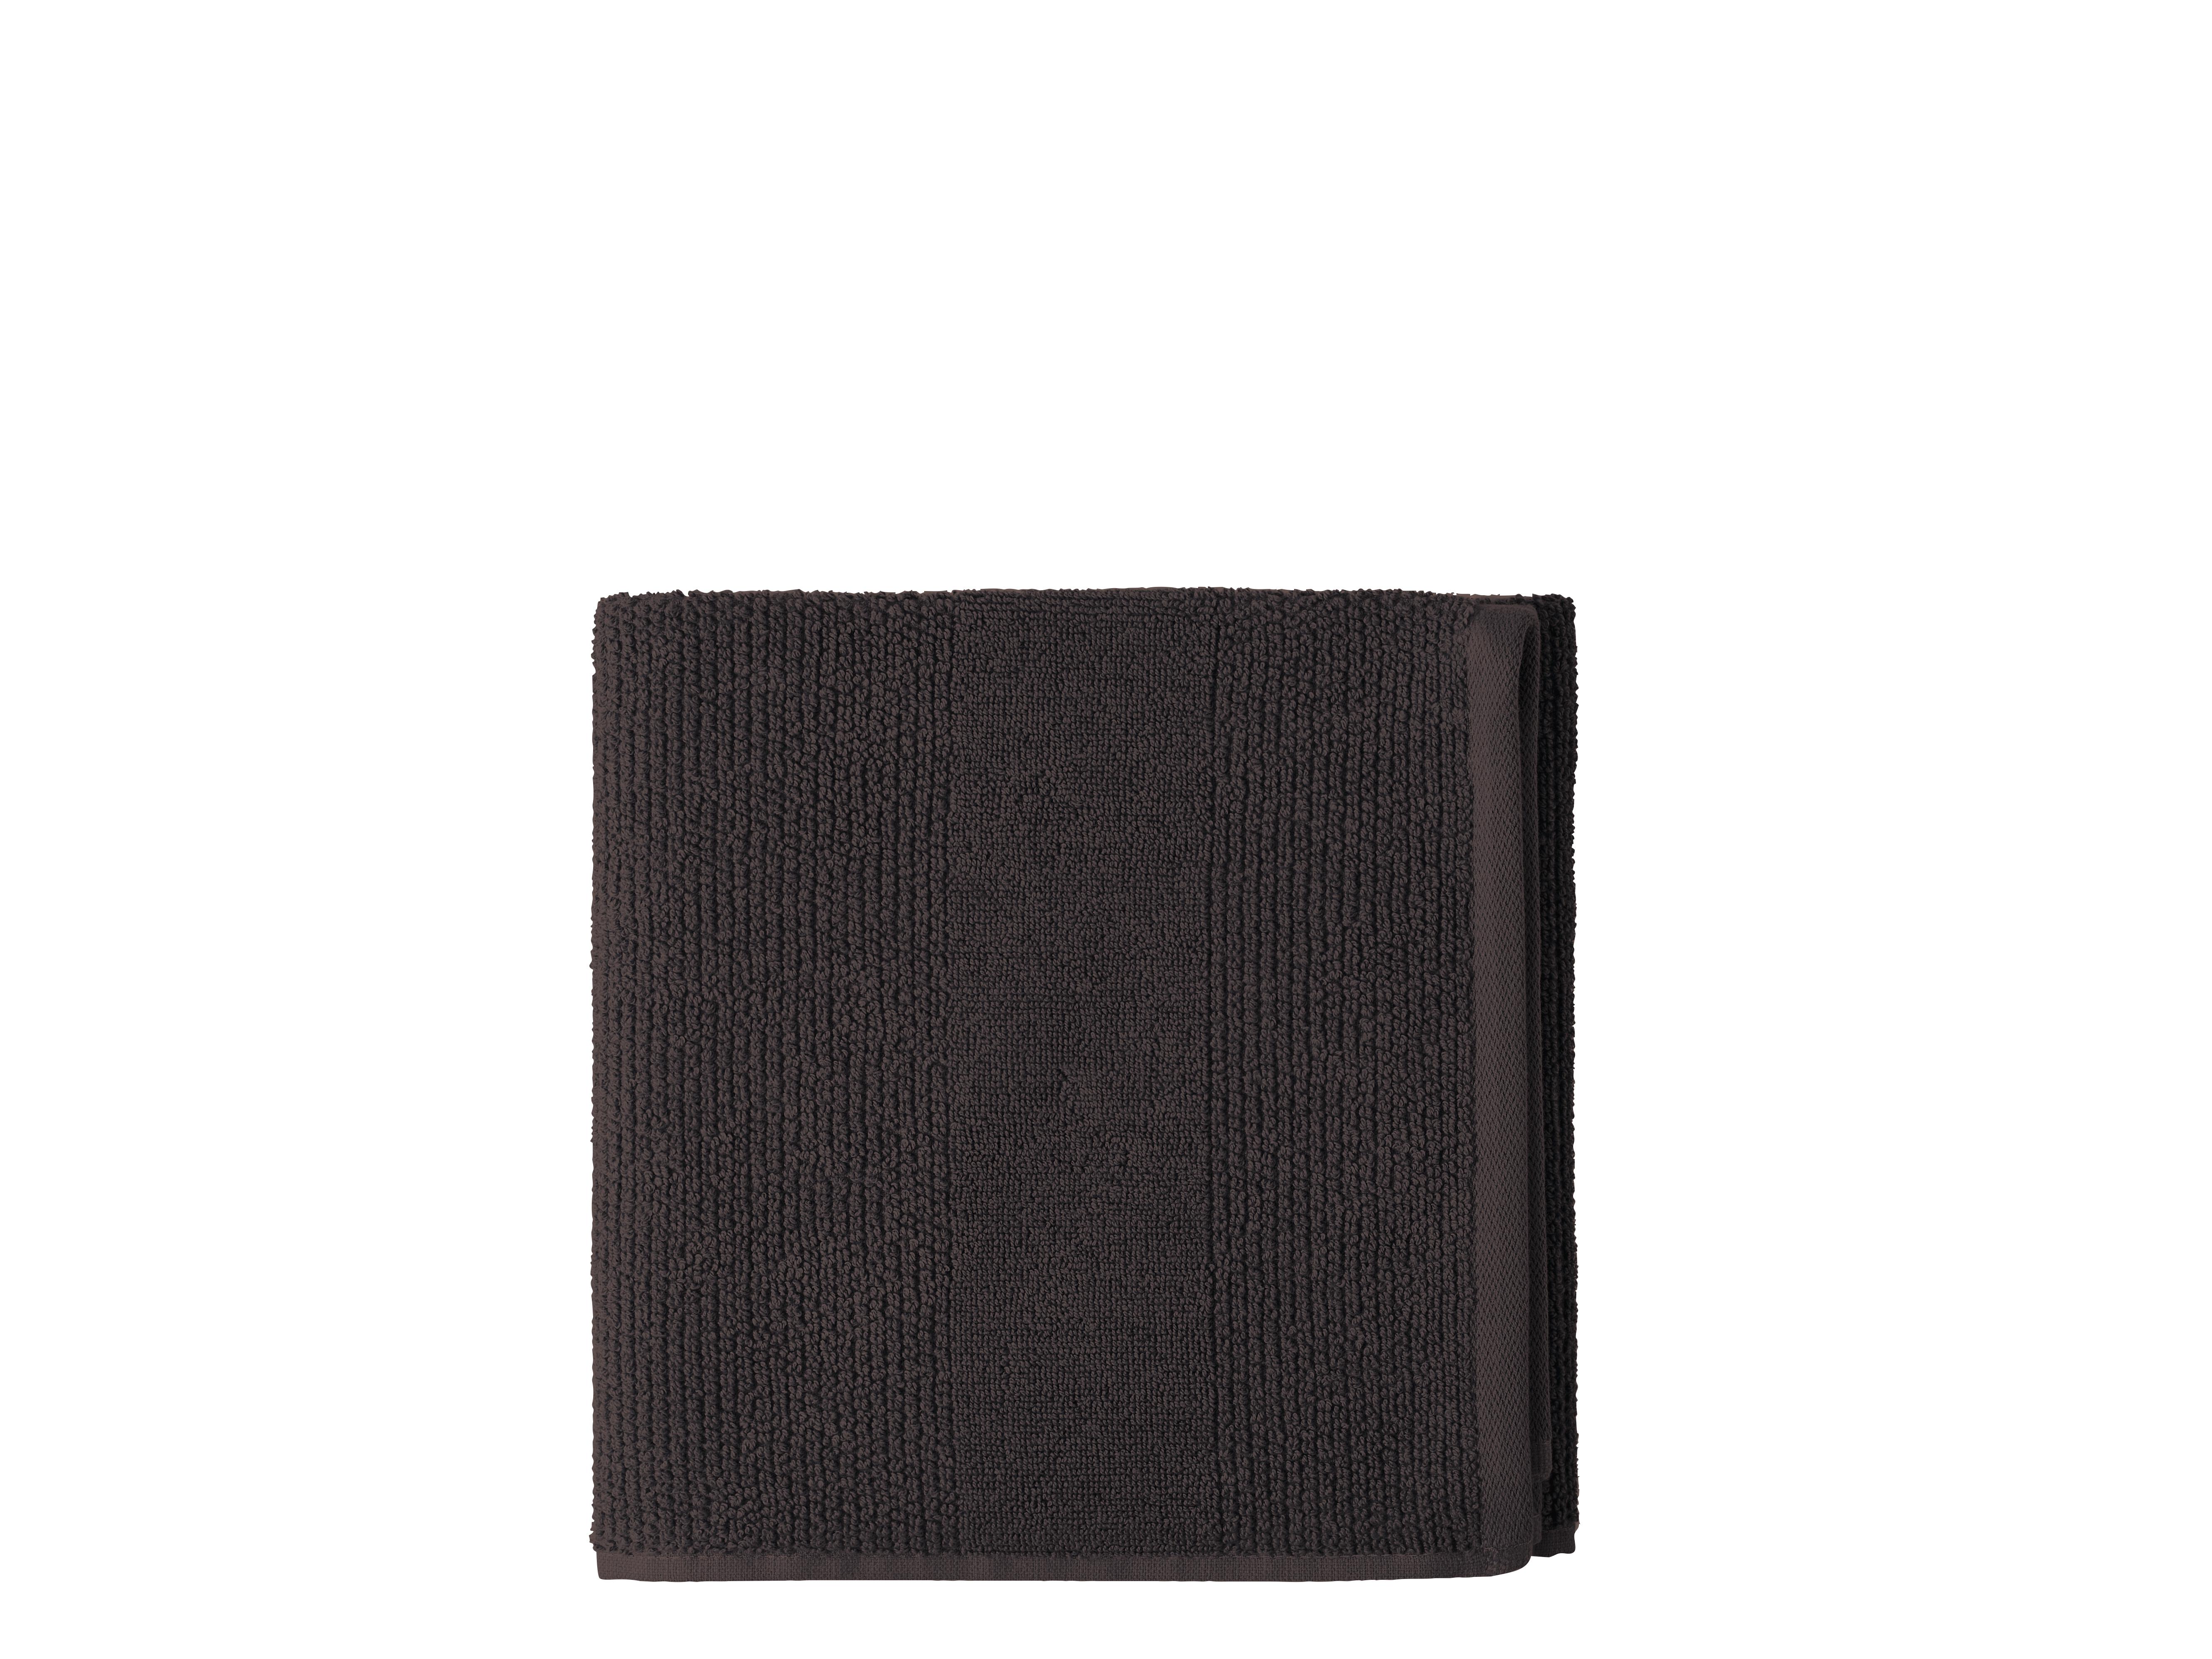 Södahl Sense håndklæde, 50x100 cm, ash